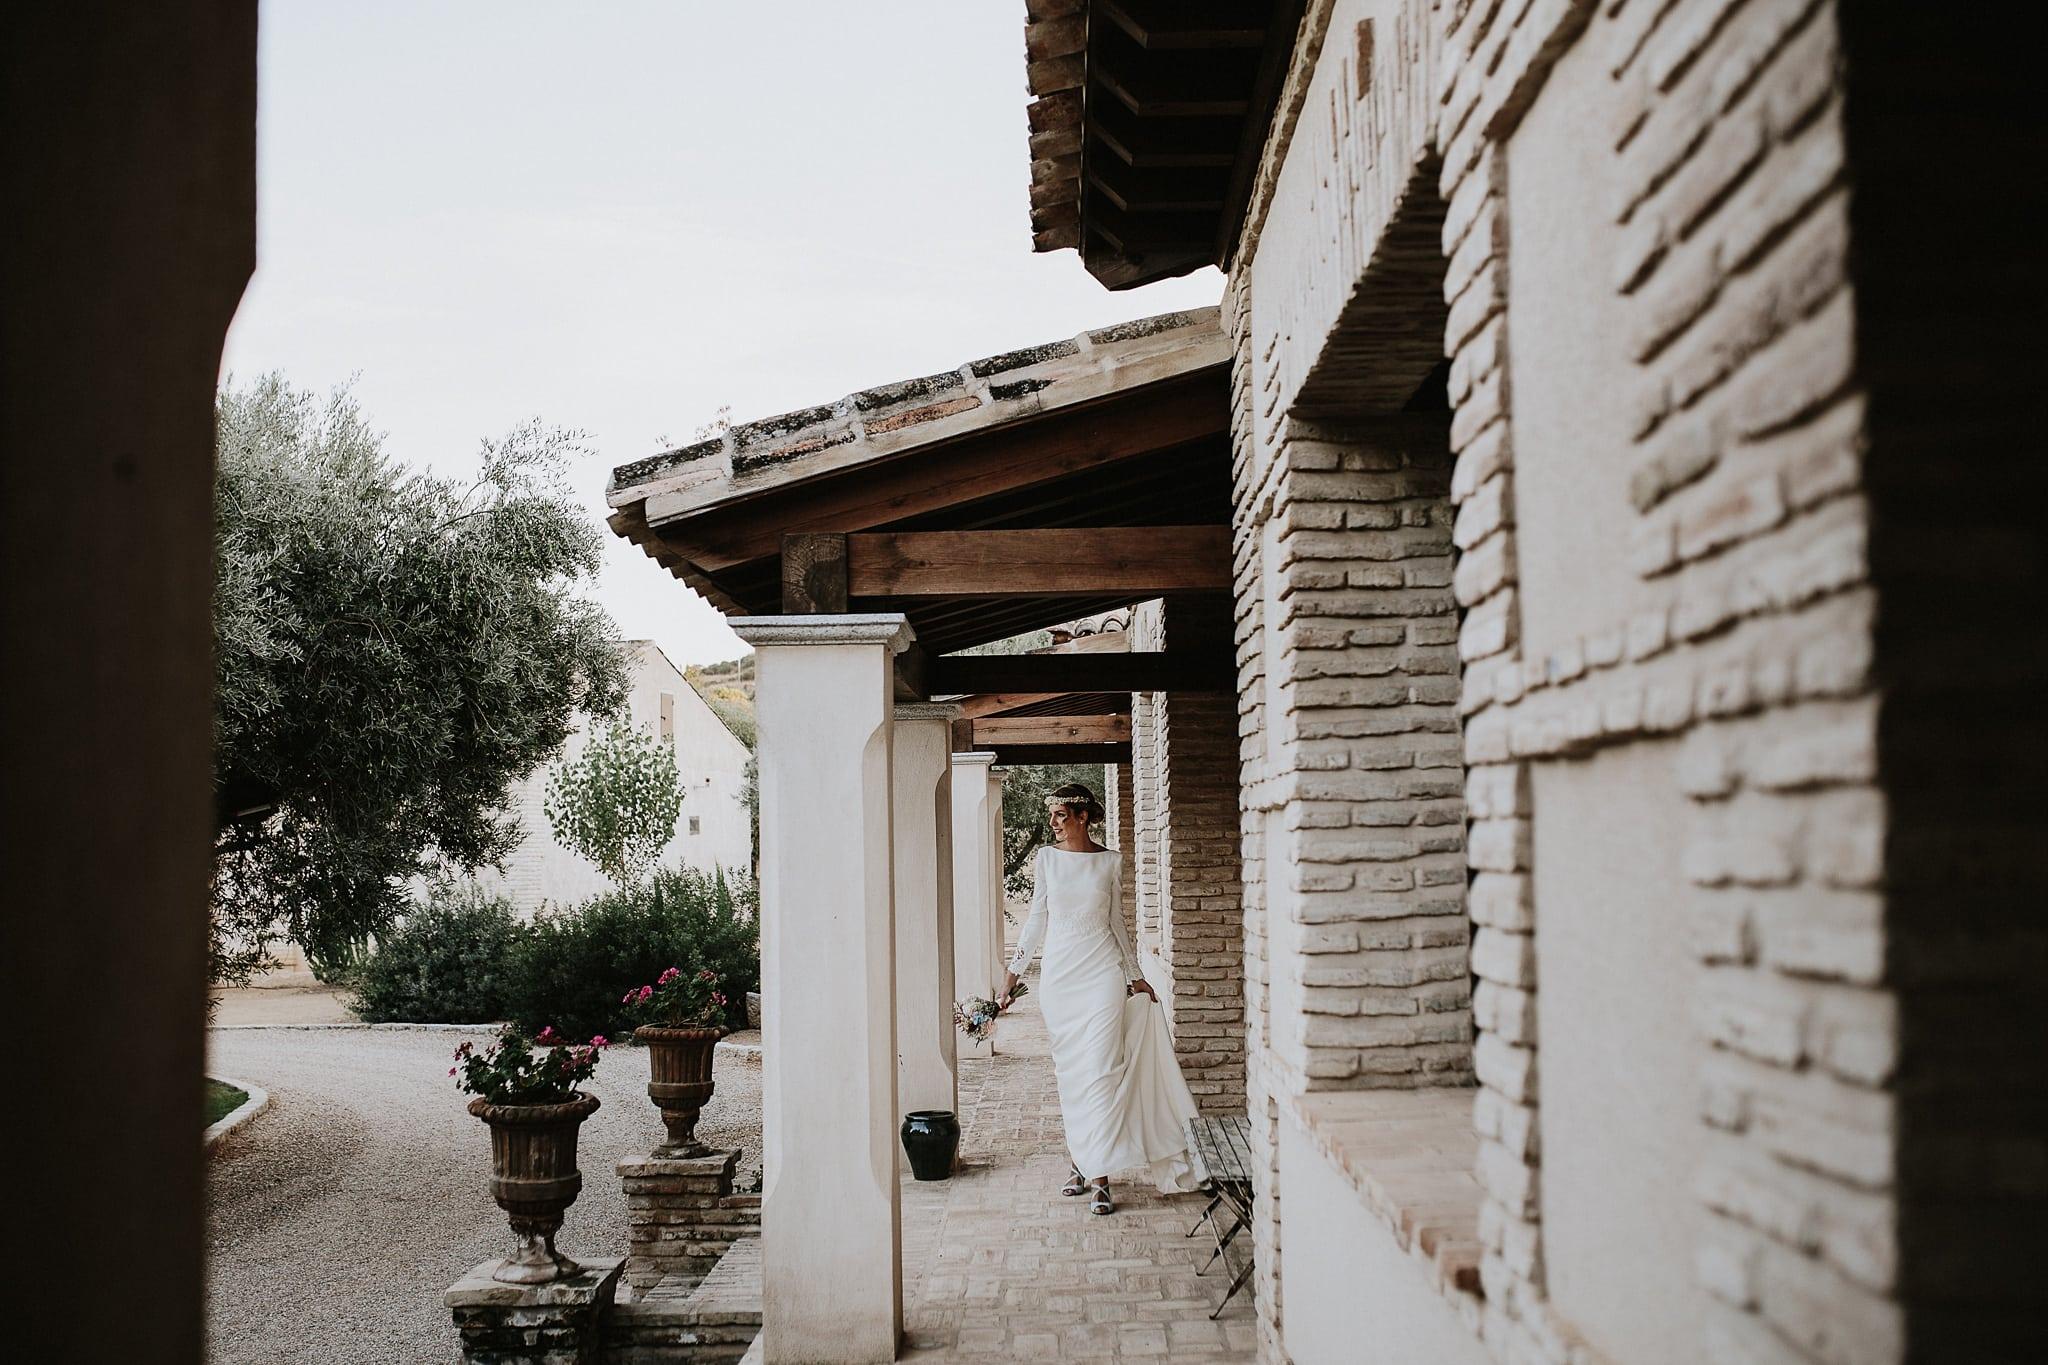 prisma-blanco-fotografos-bodas-toledo-99